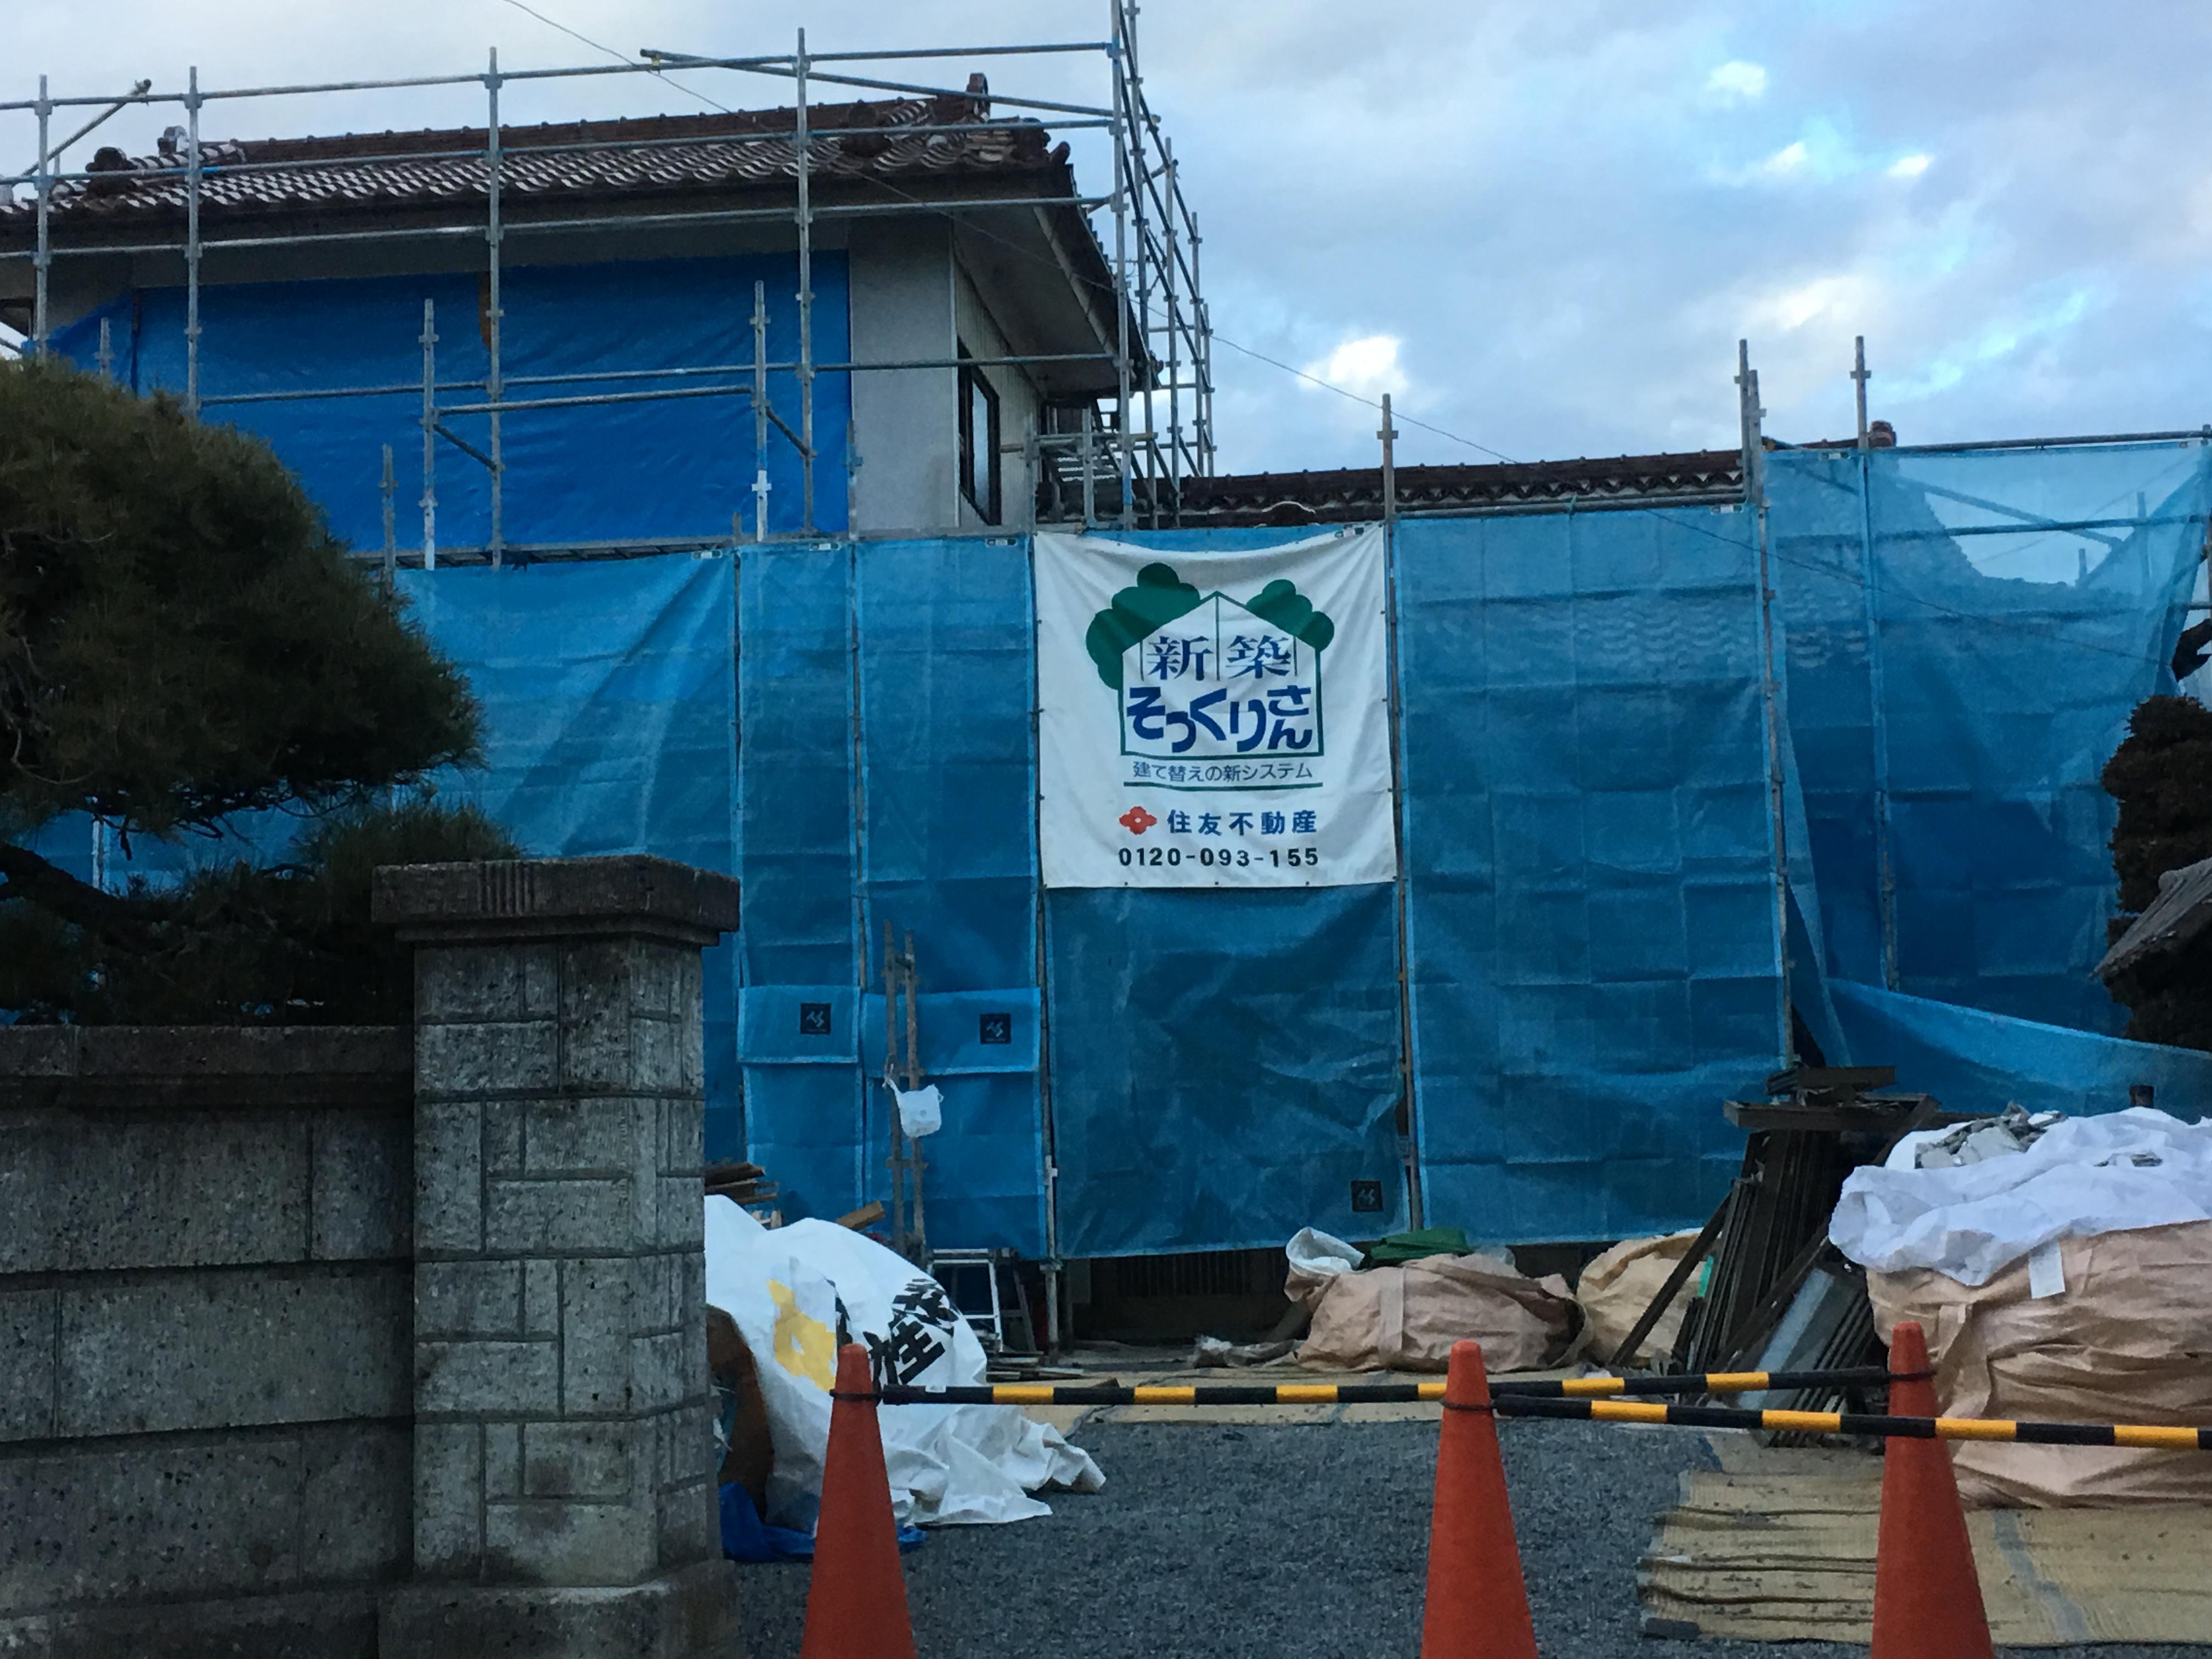 odaka decontamination work sign.JPG